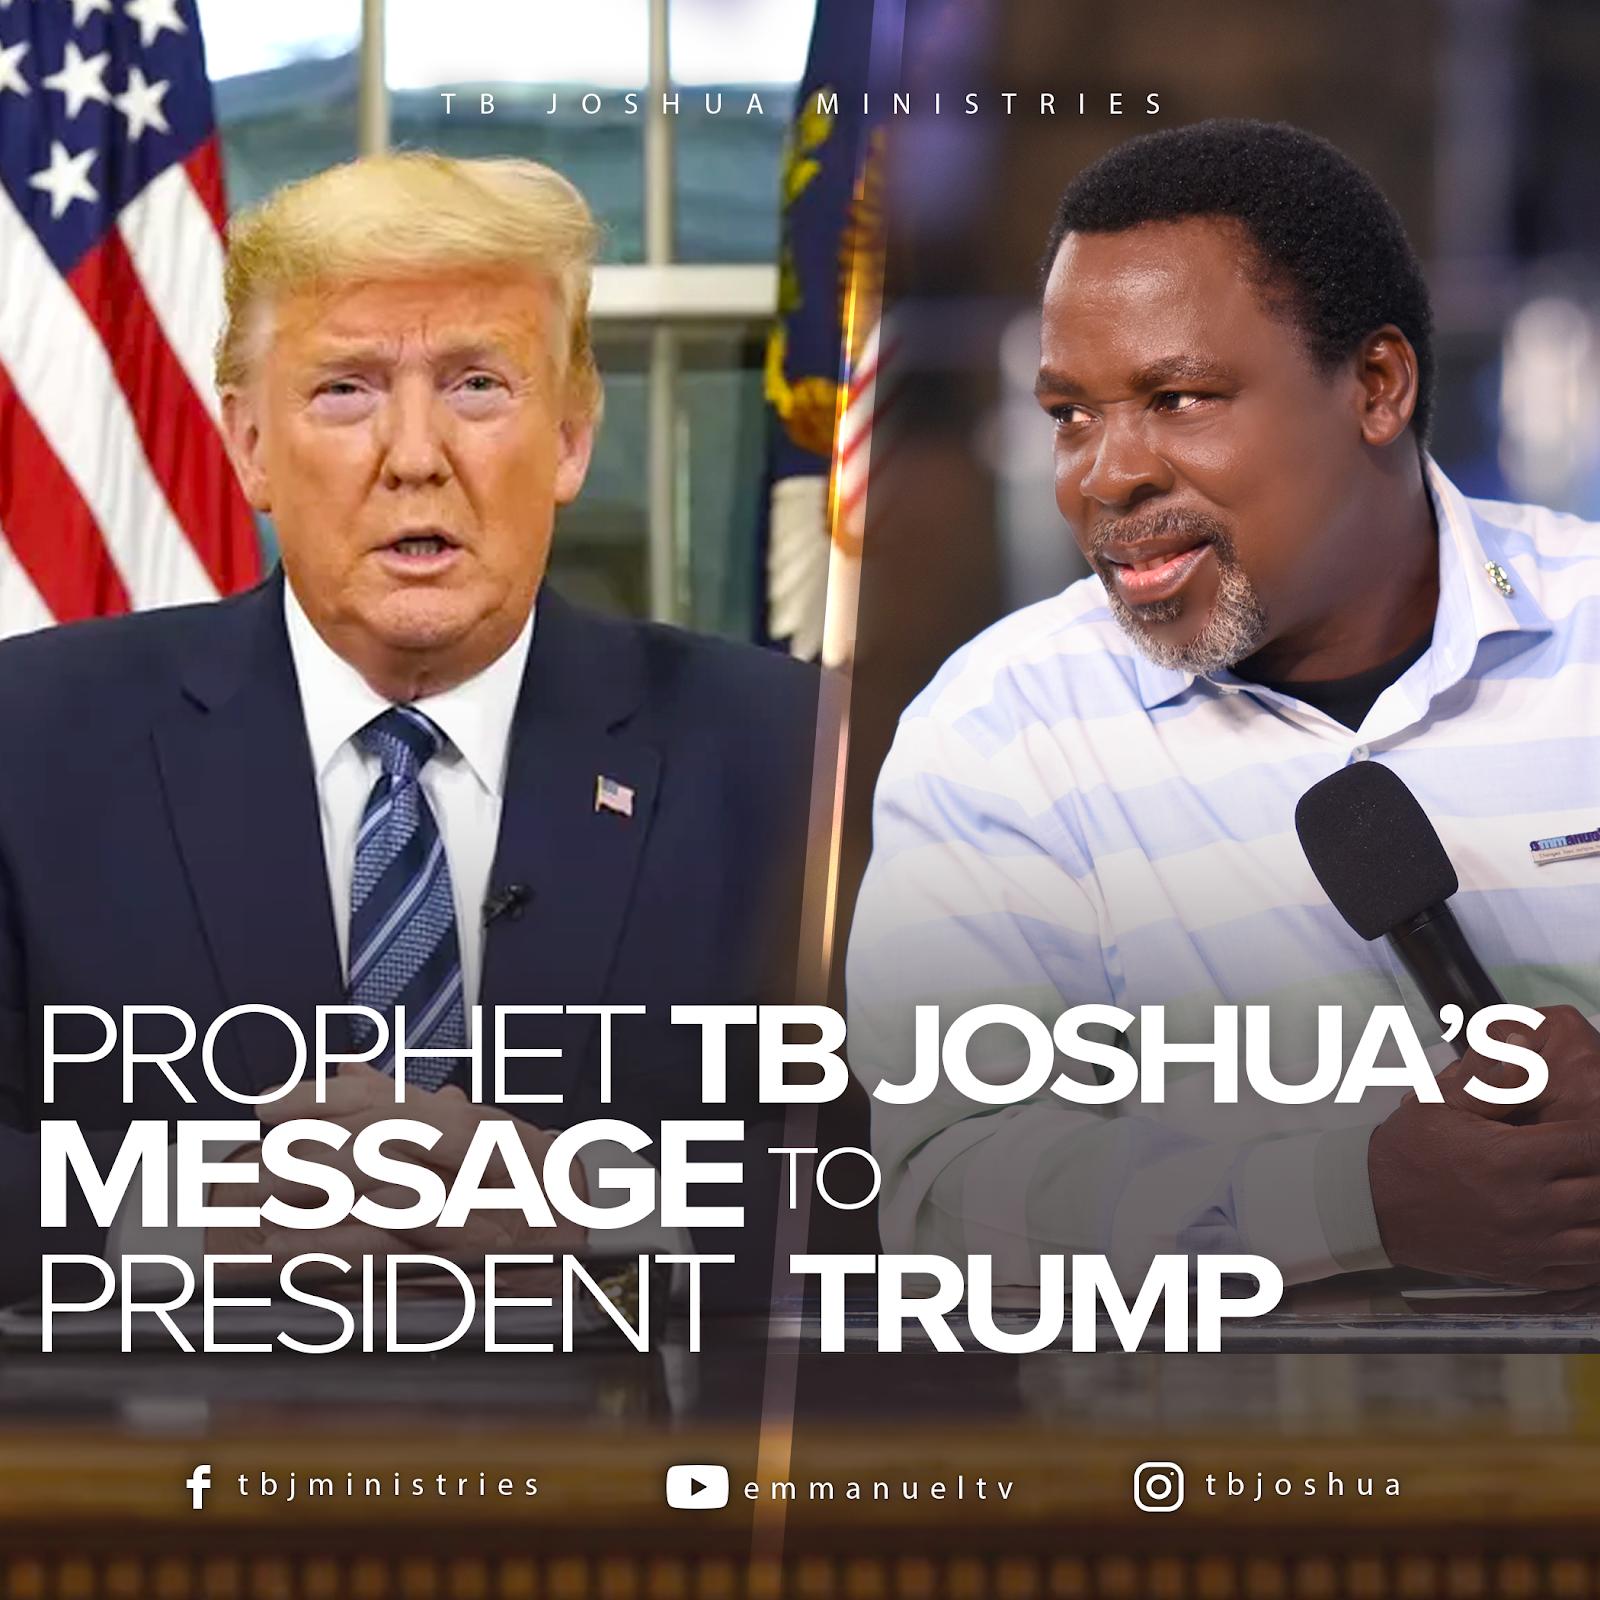 2020 Prophecy, President Trump, EU, USA, Coronavirus, SCOAN, TB Joshua, Emmanuel.TV,